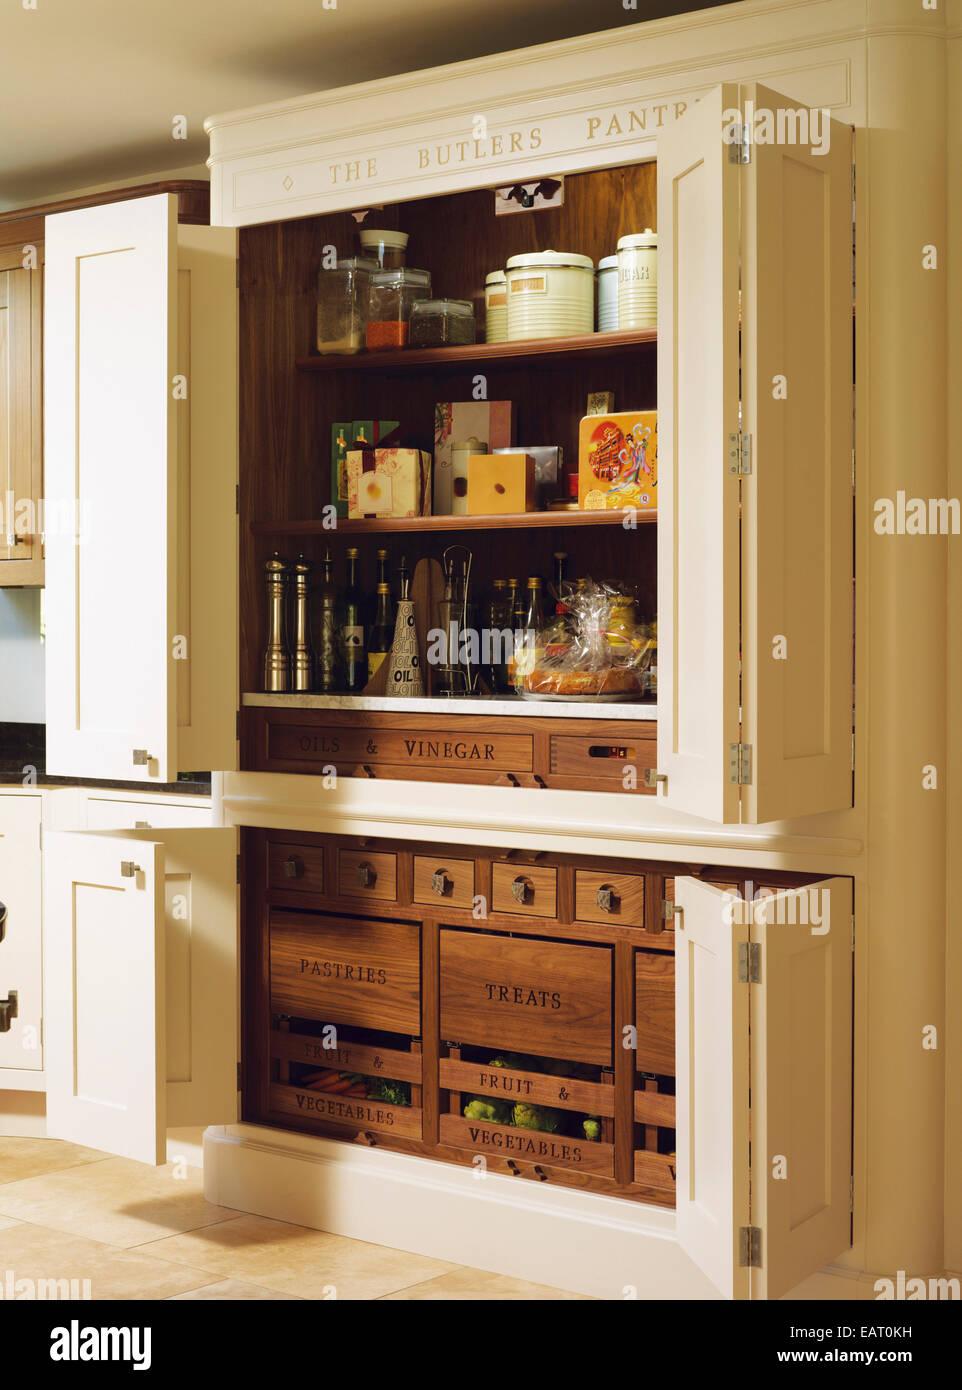 Built In Larder, Pantry Storage Unit With Doors Open